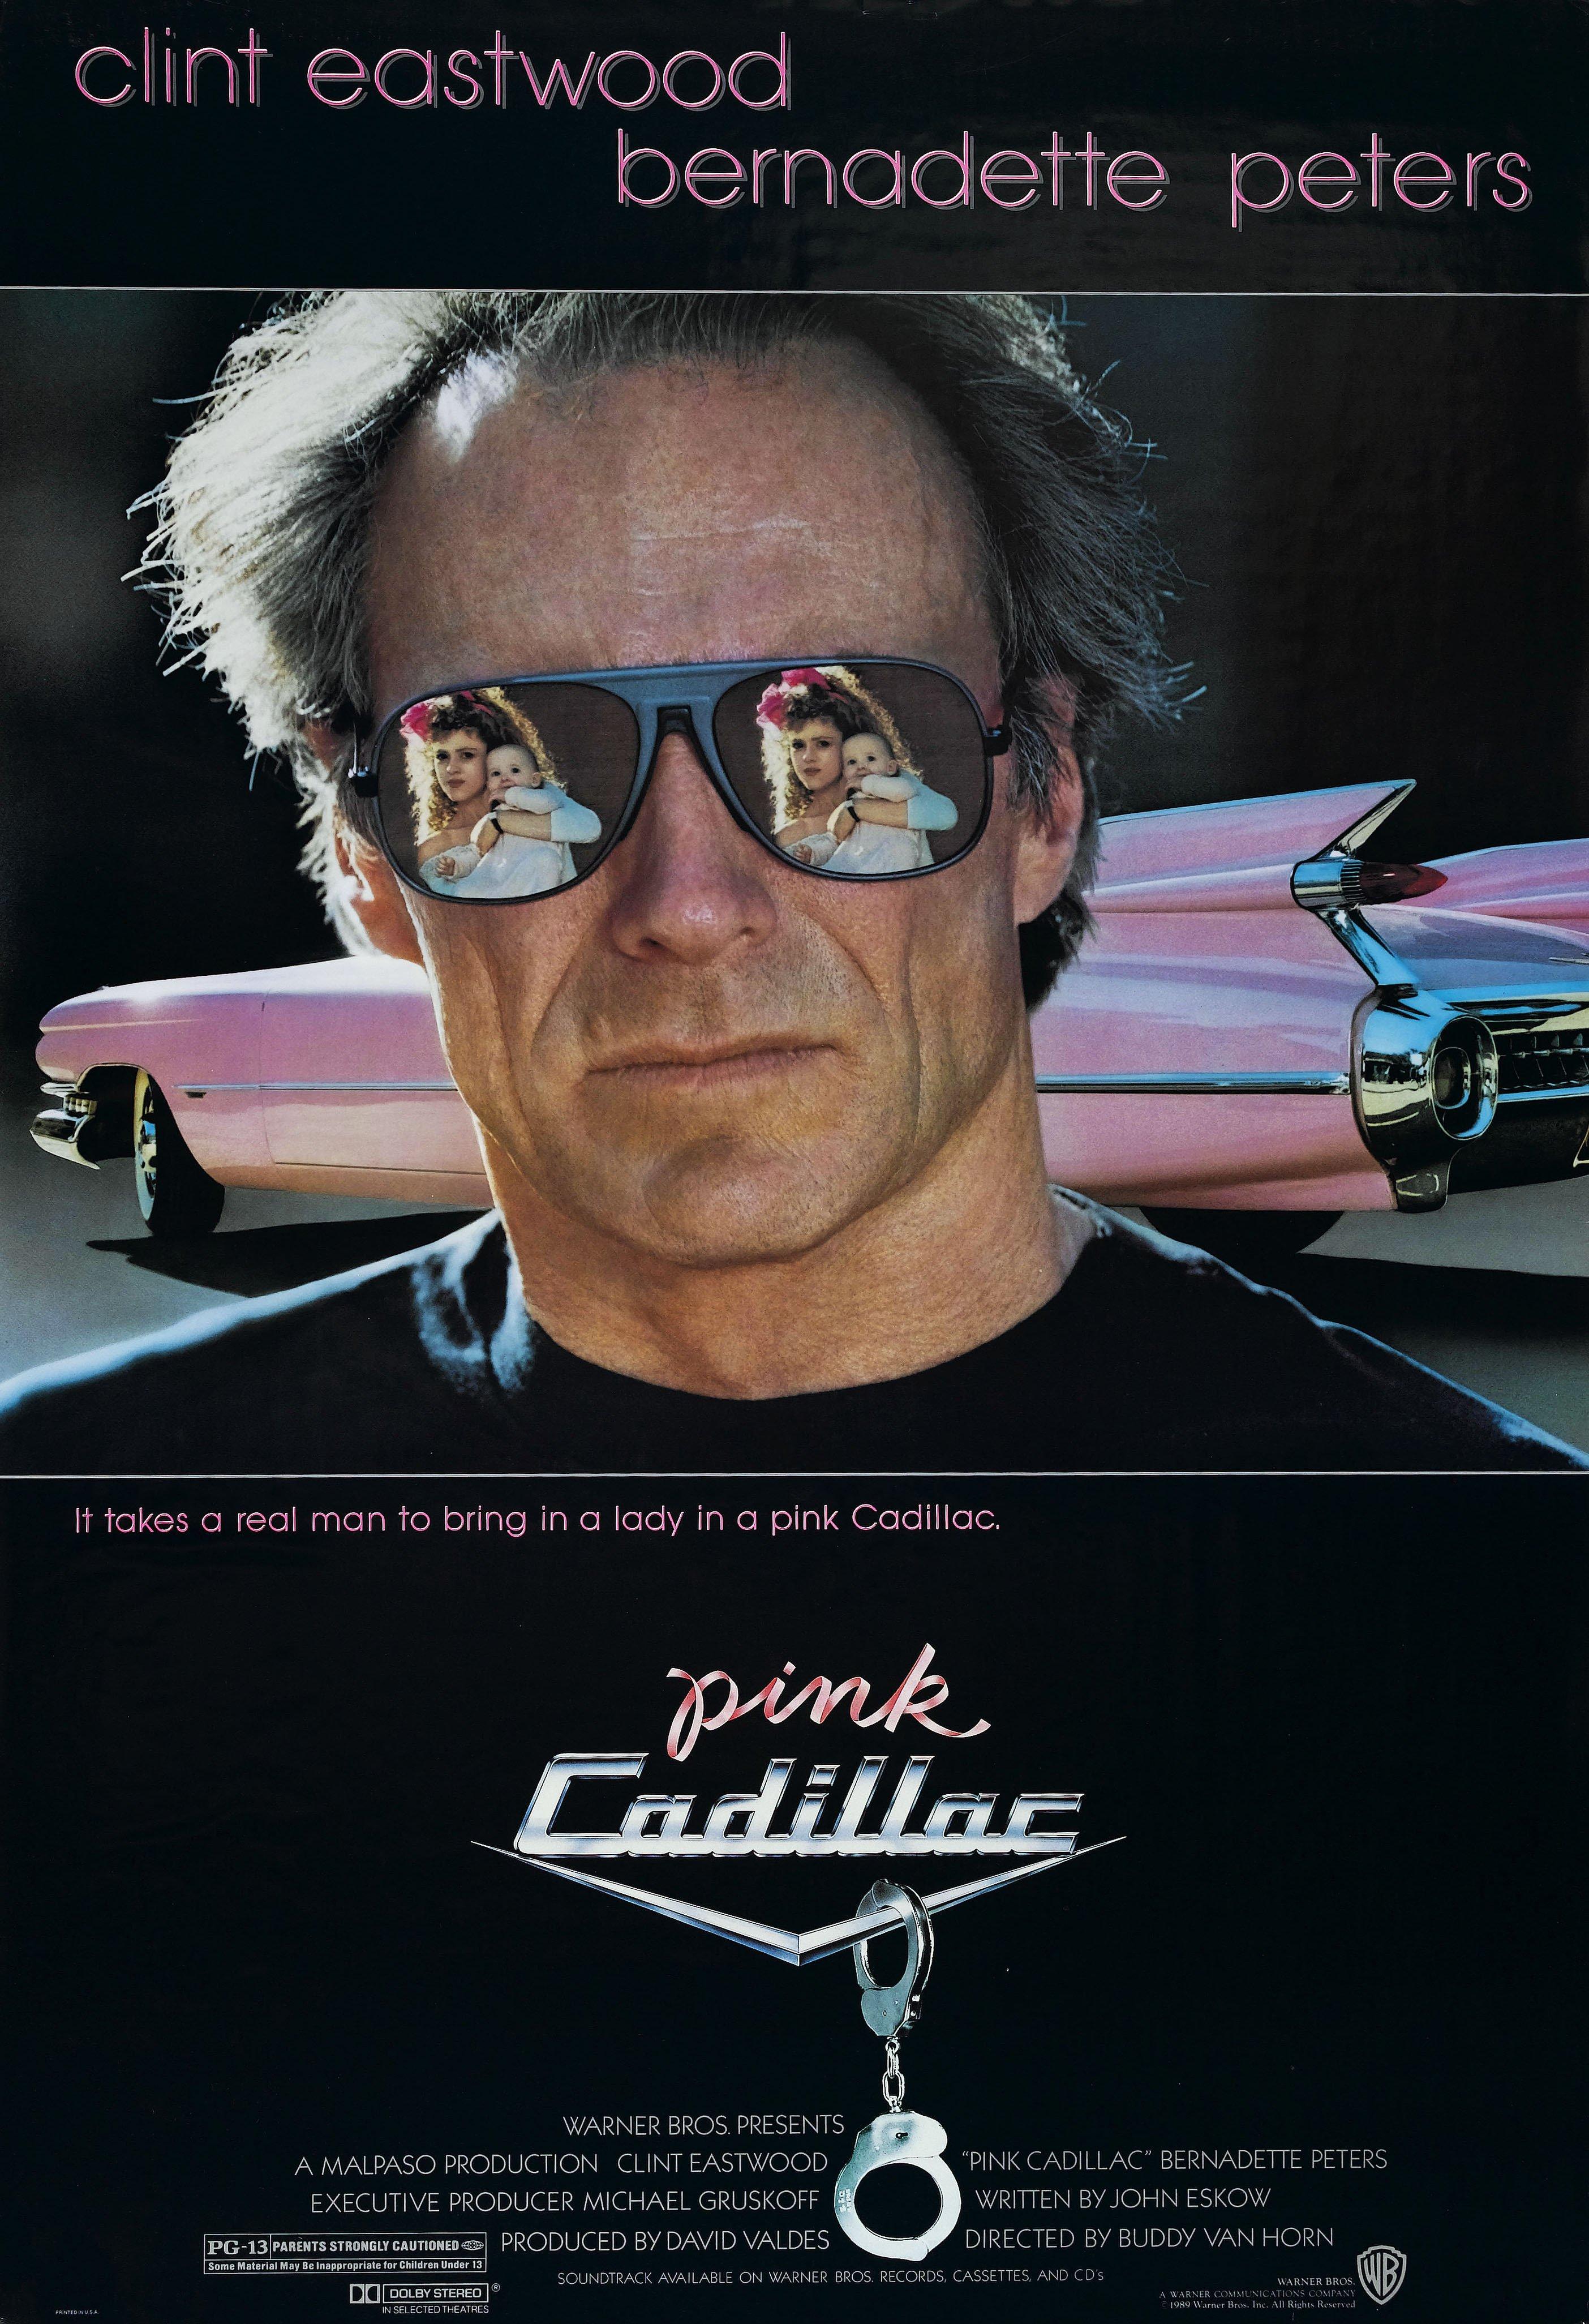 affiche du film Pink Cadillac